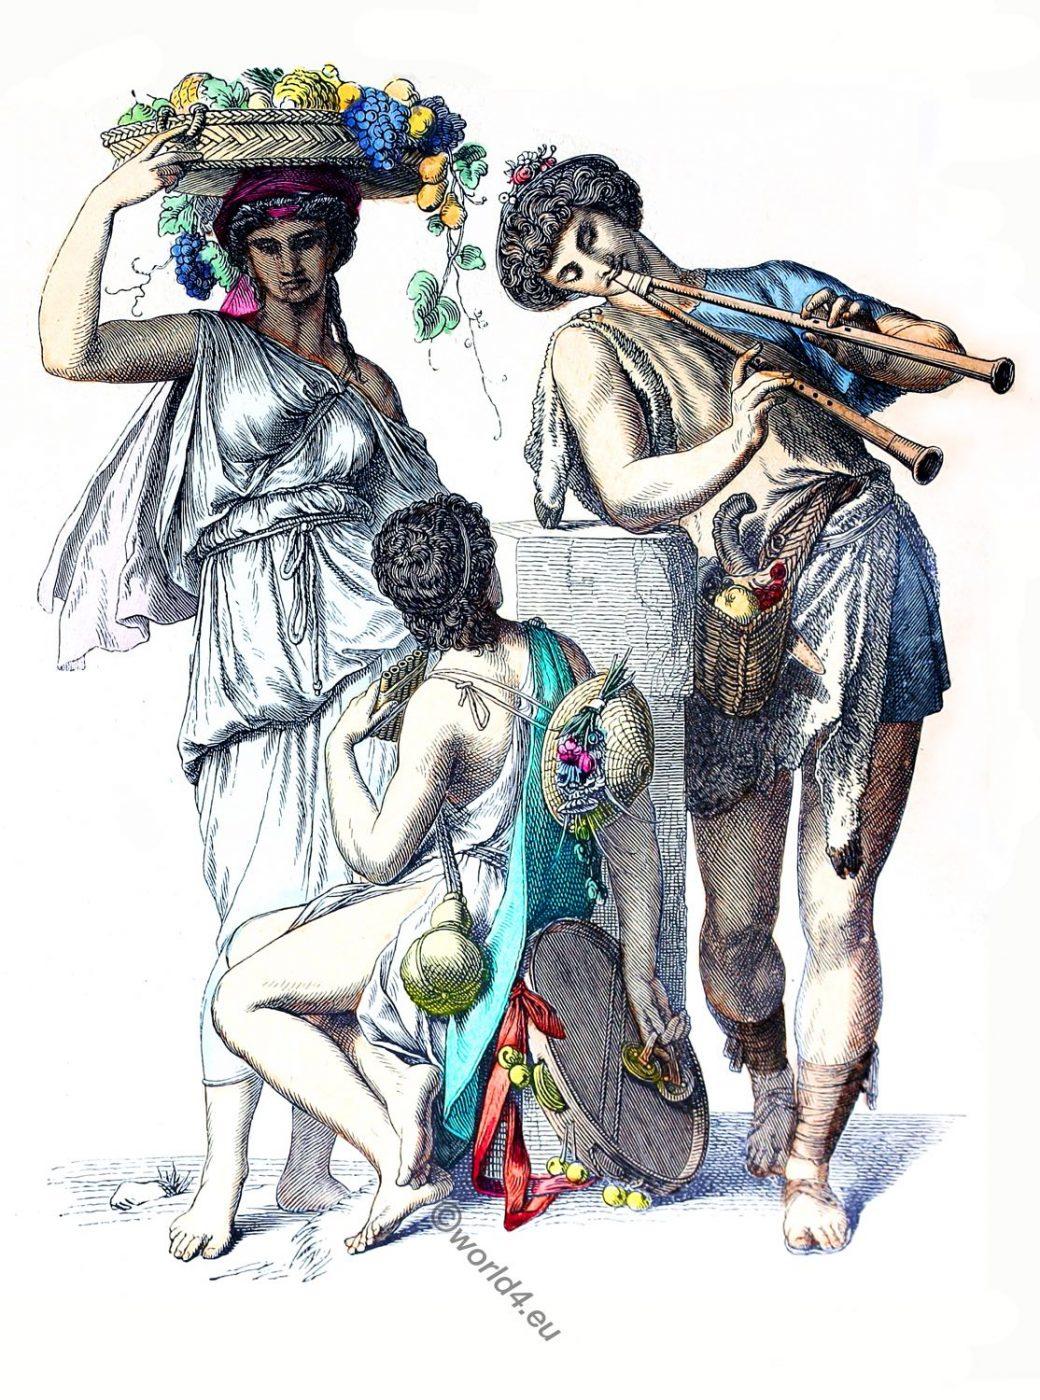 Ancient, Greek, peasants, costumes, dress, clothing